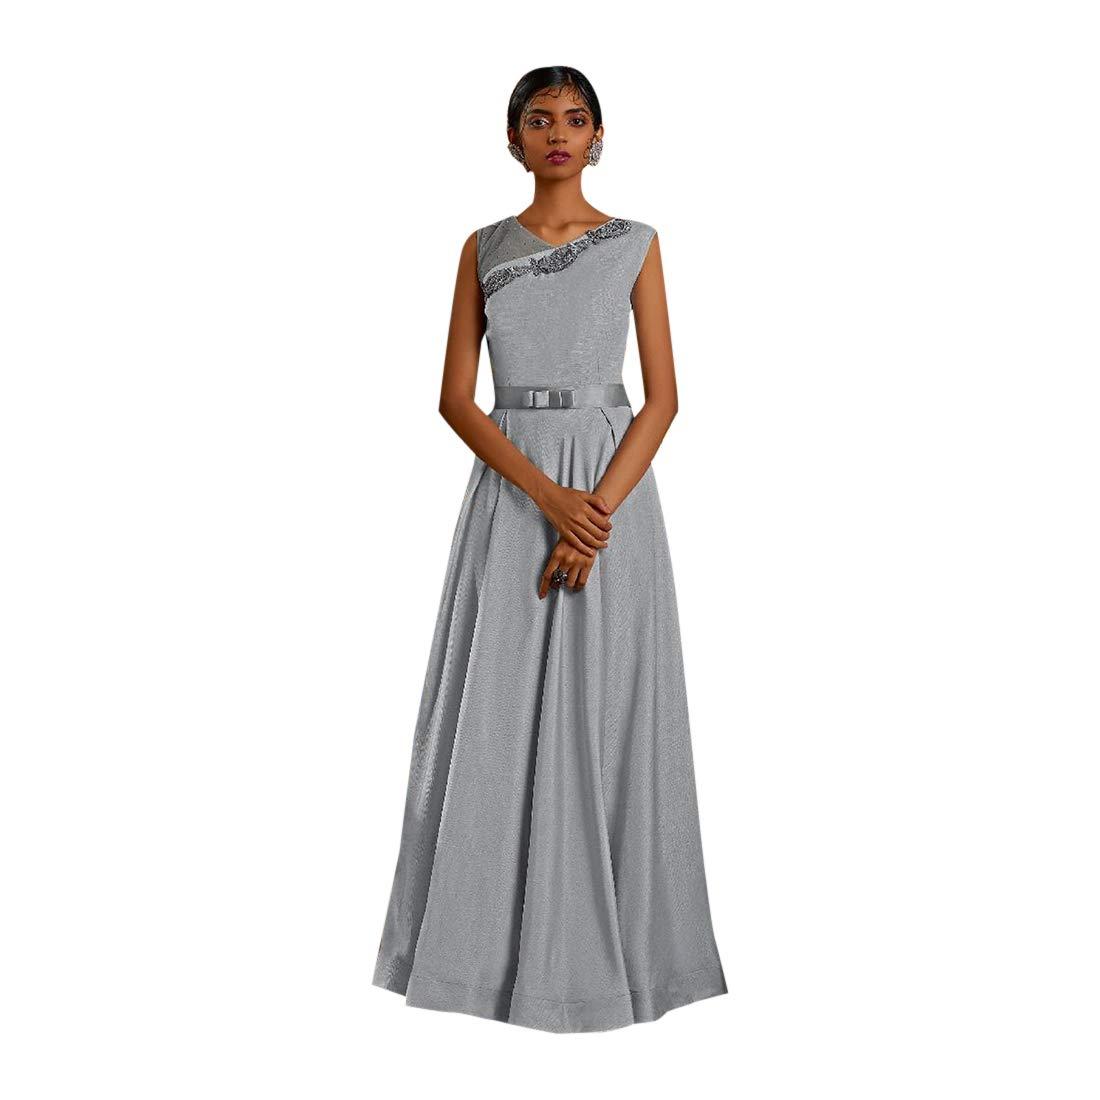 Maxi Dress Online Shopping In Pakistan   Saddha